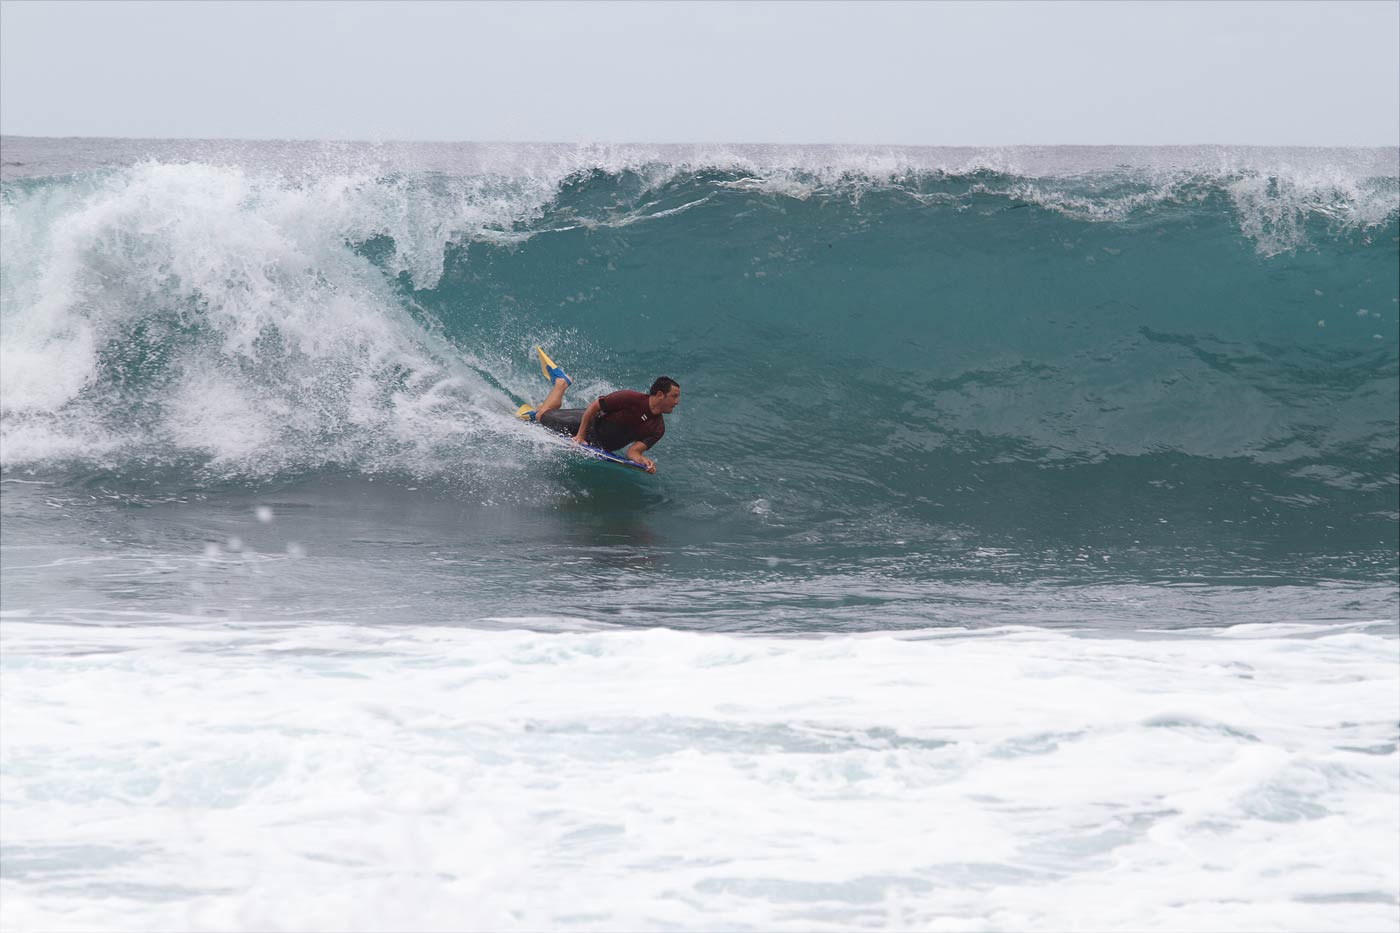 Серфинг, северное побережье Теренифе